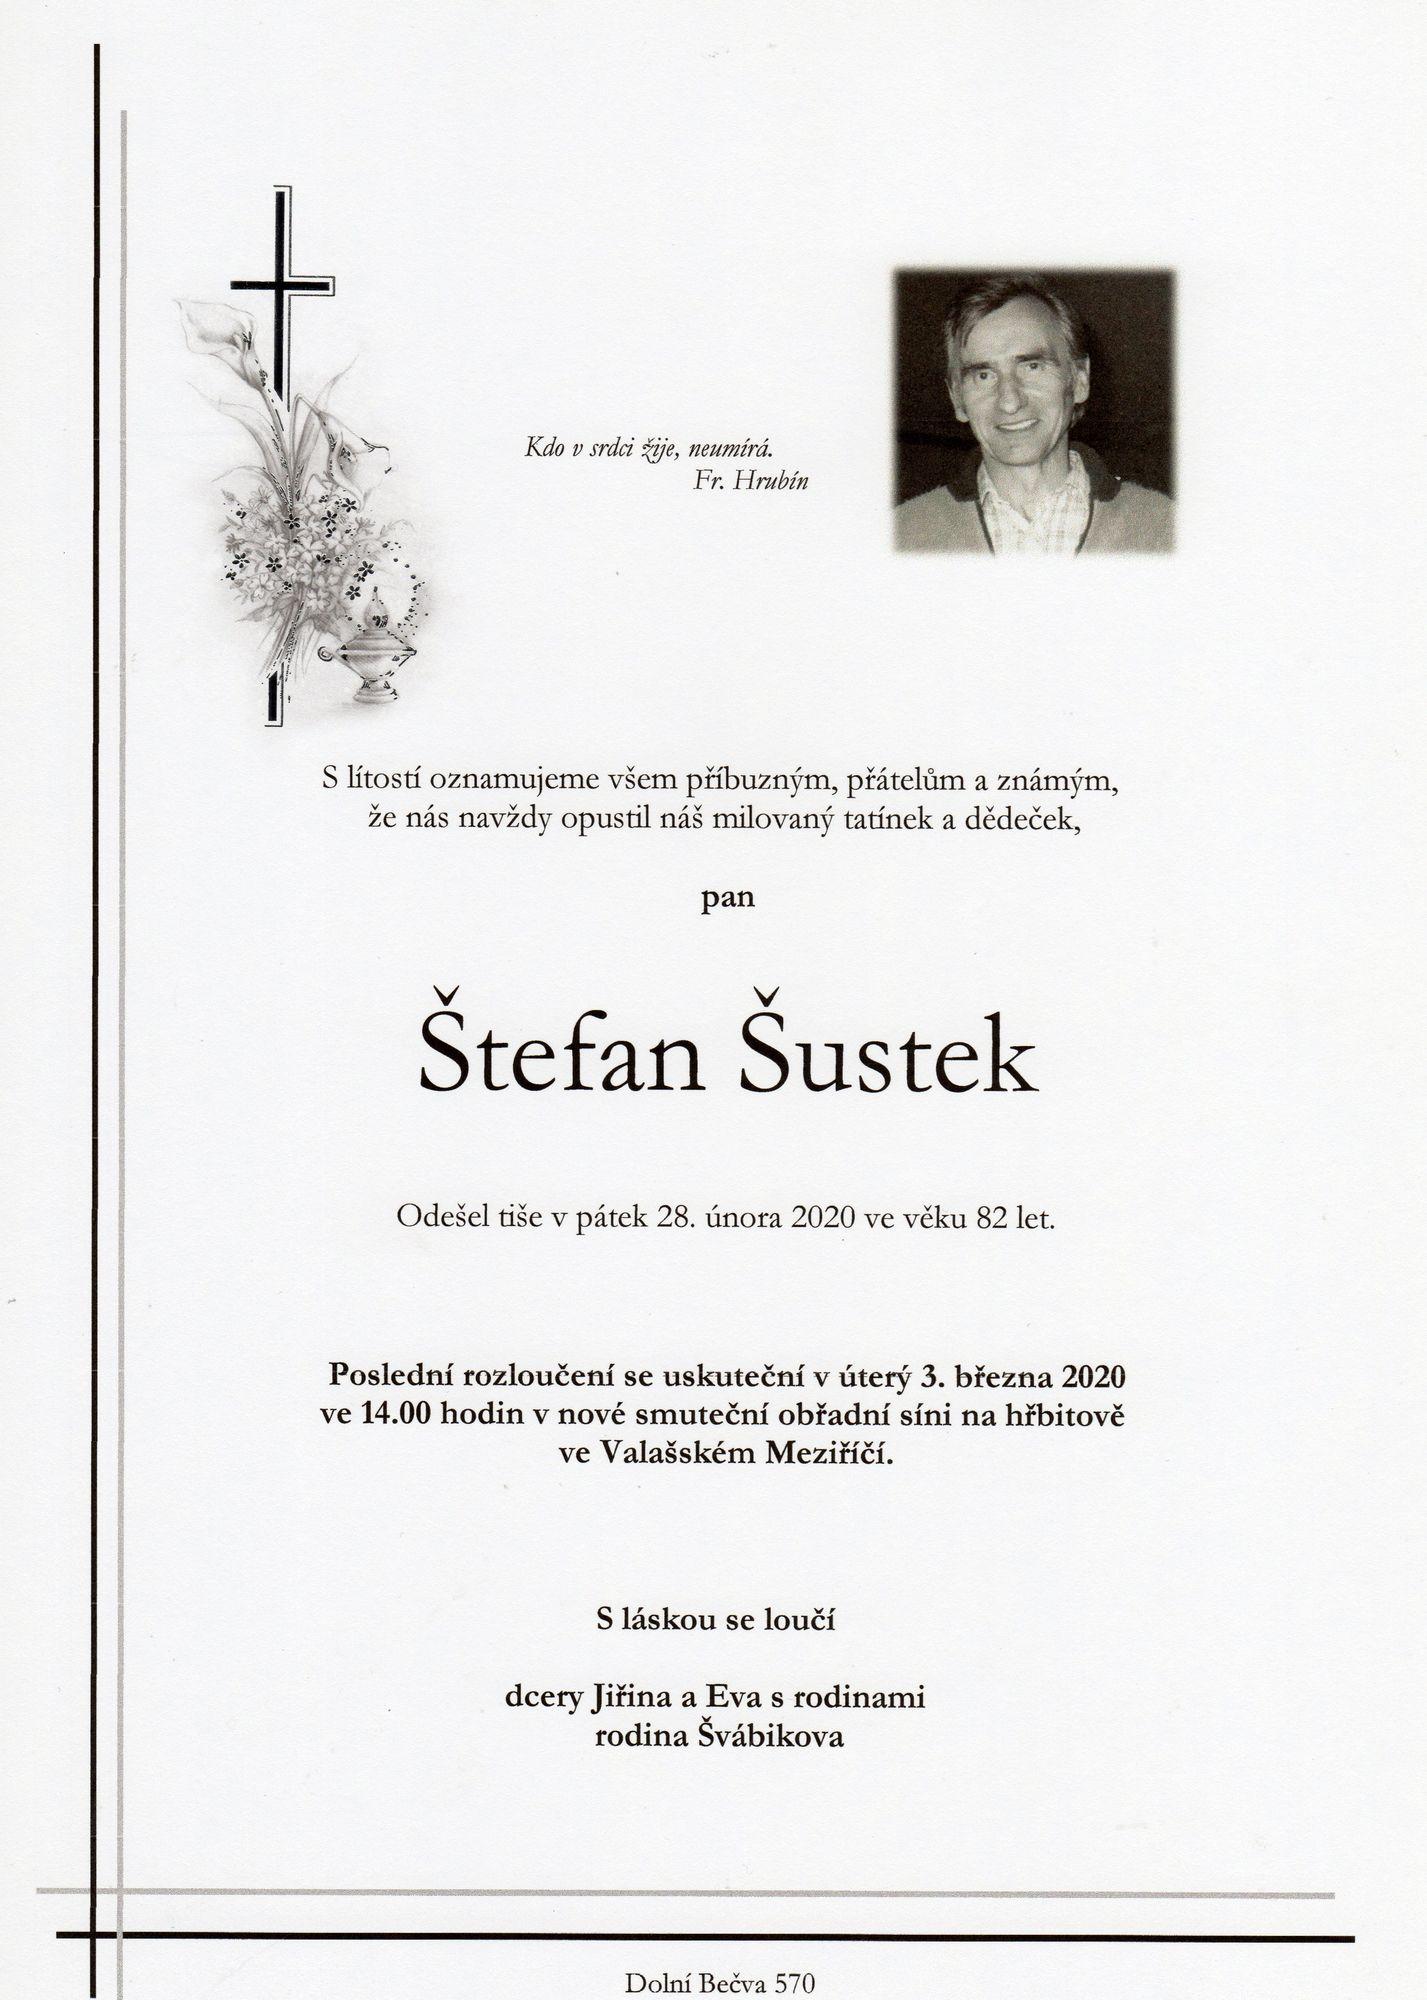 Štefan Šustek